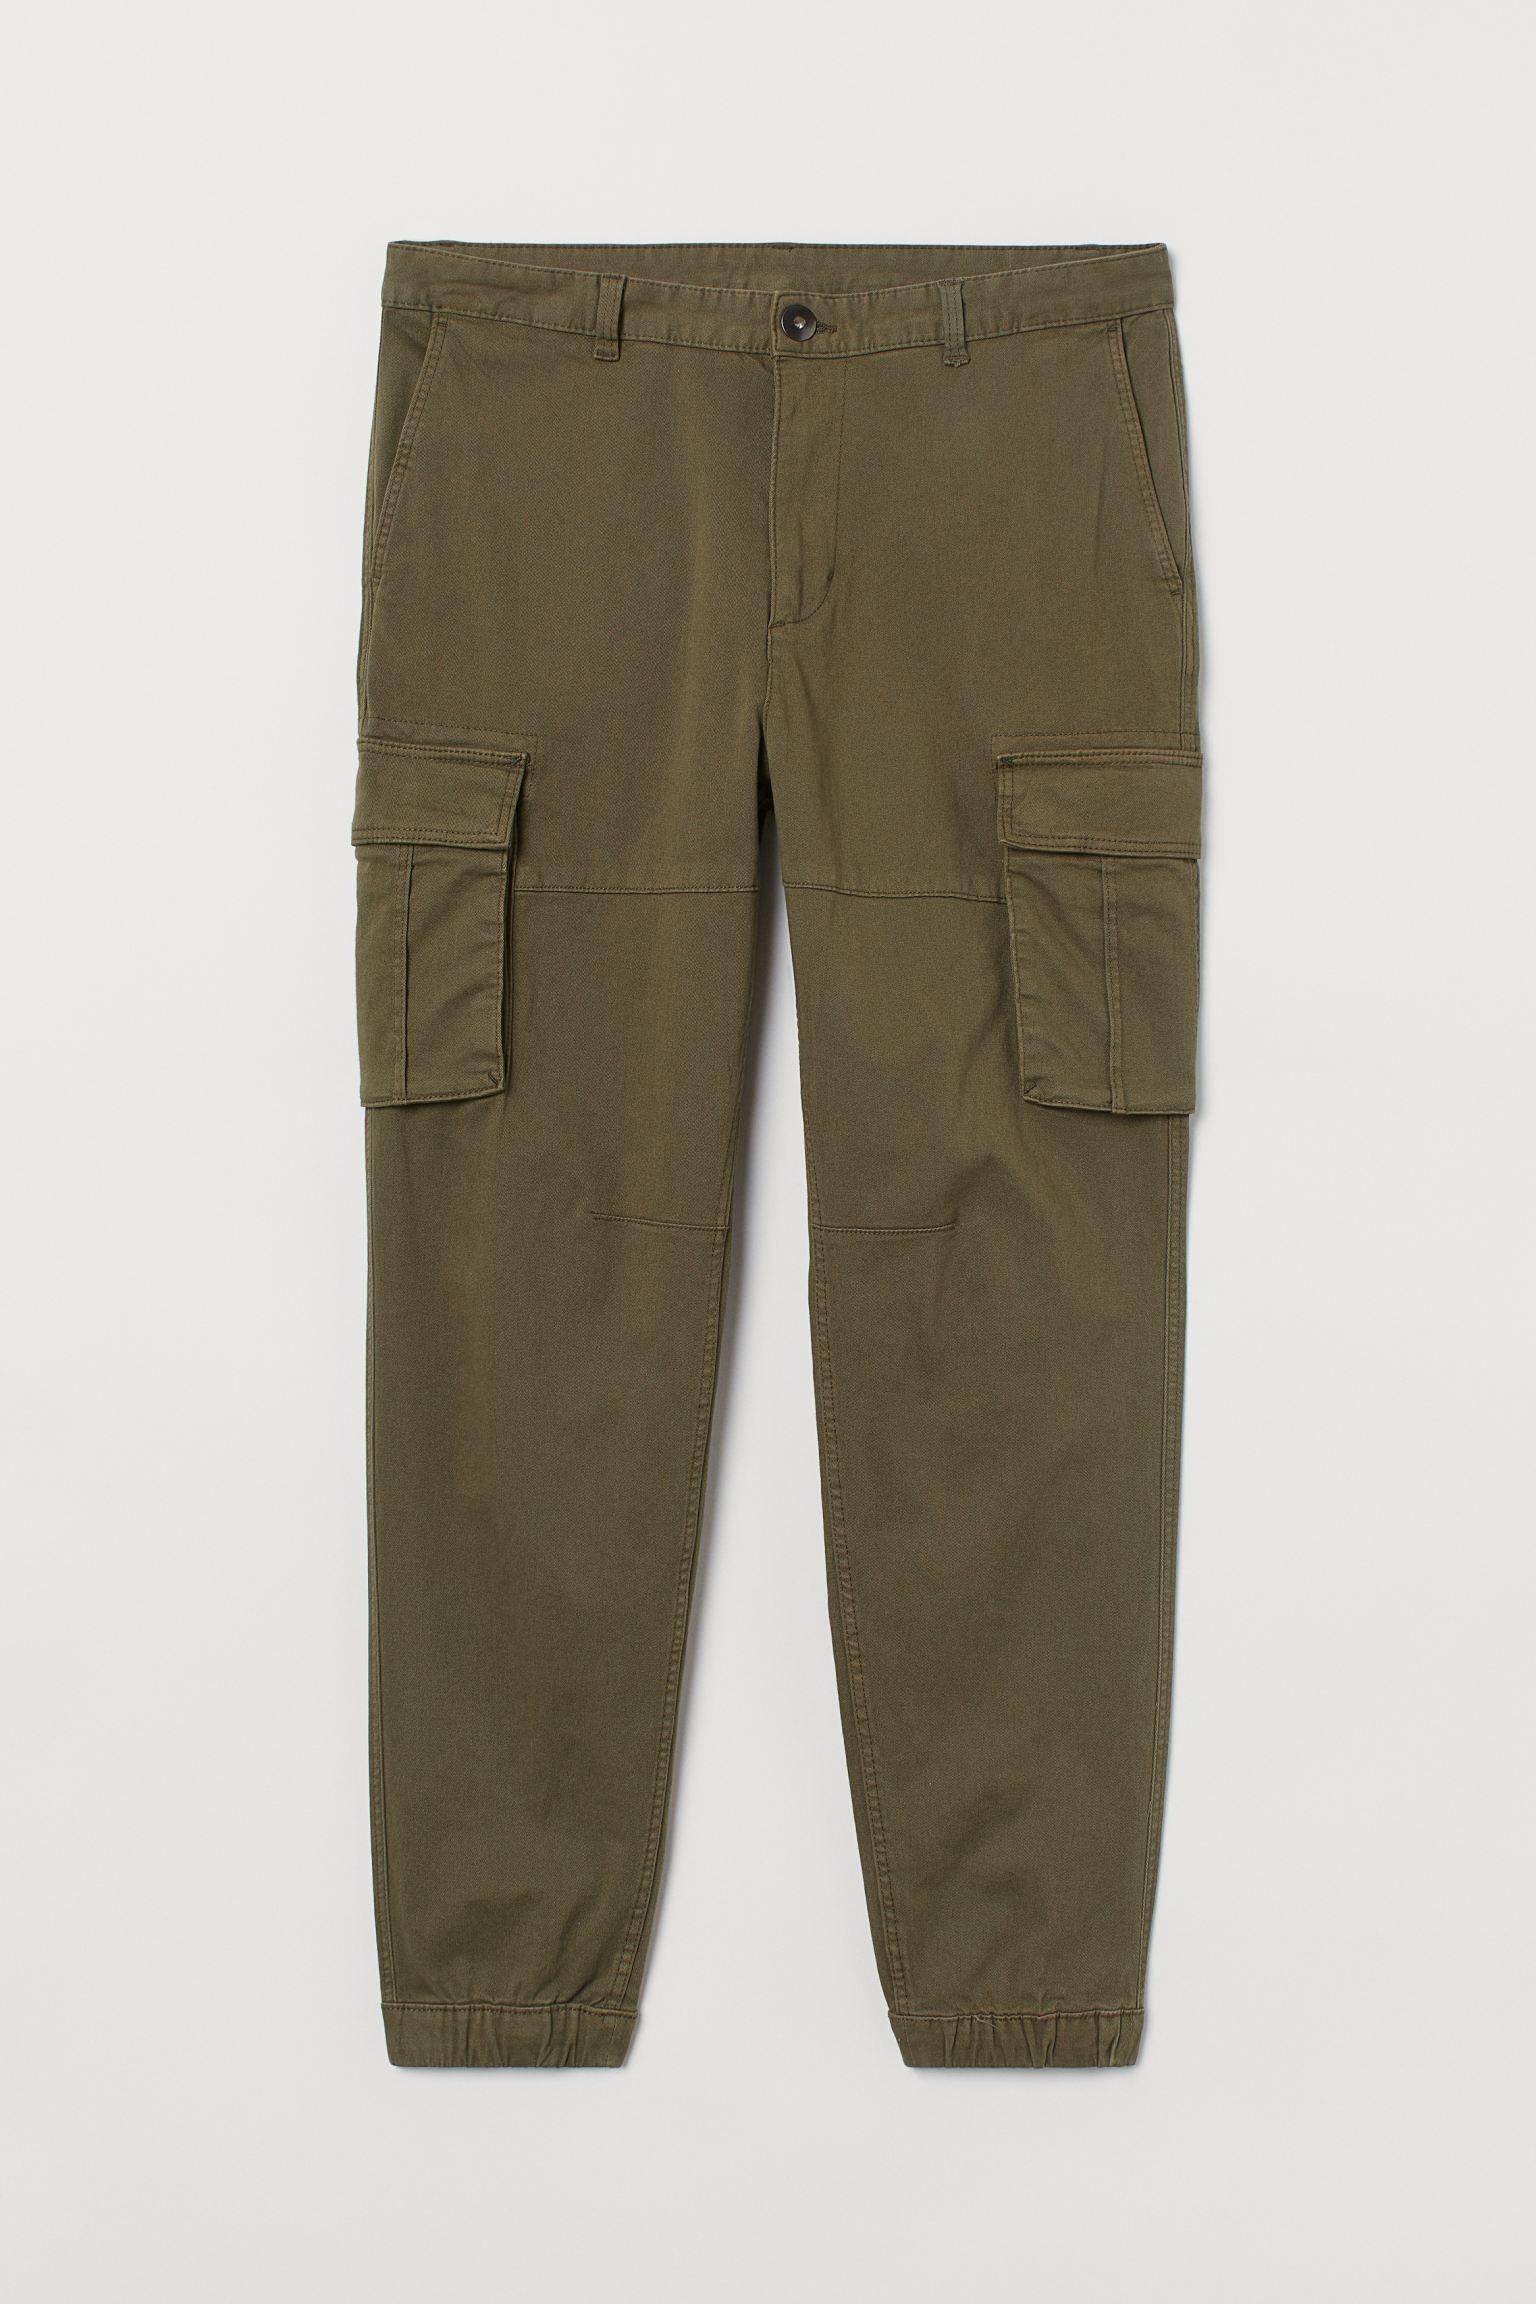 H&M Slim Fit Cargo Pants in green